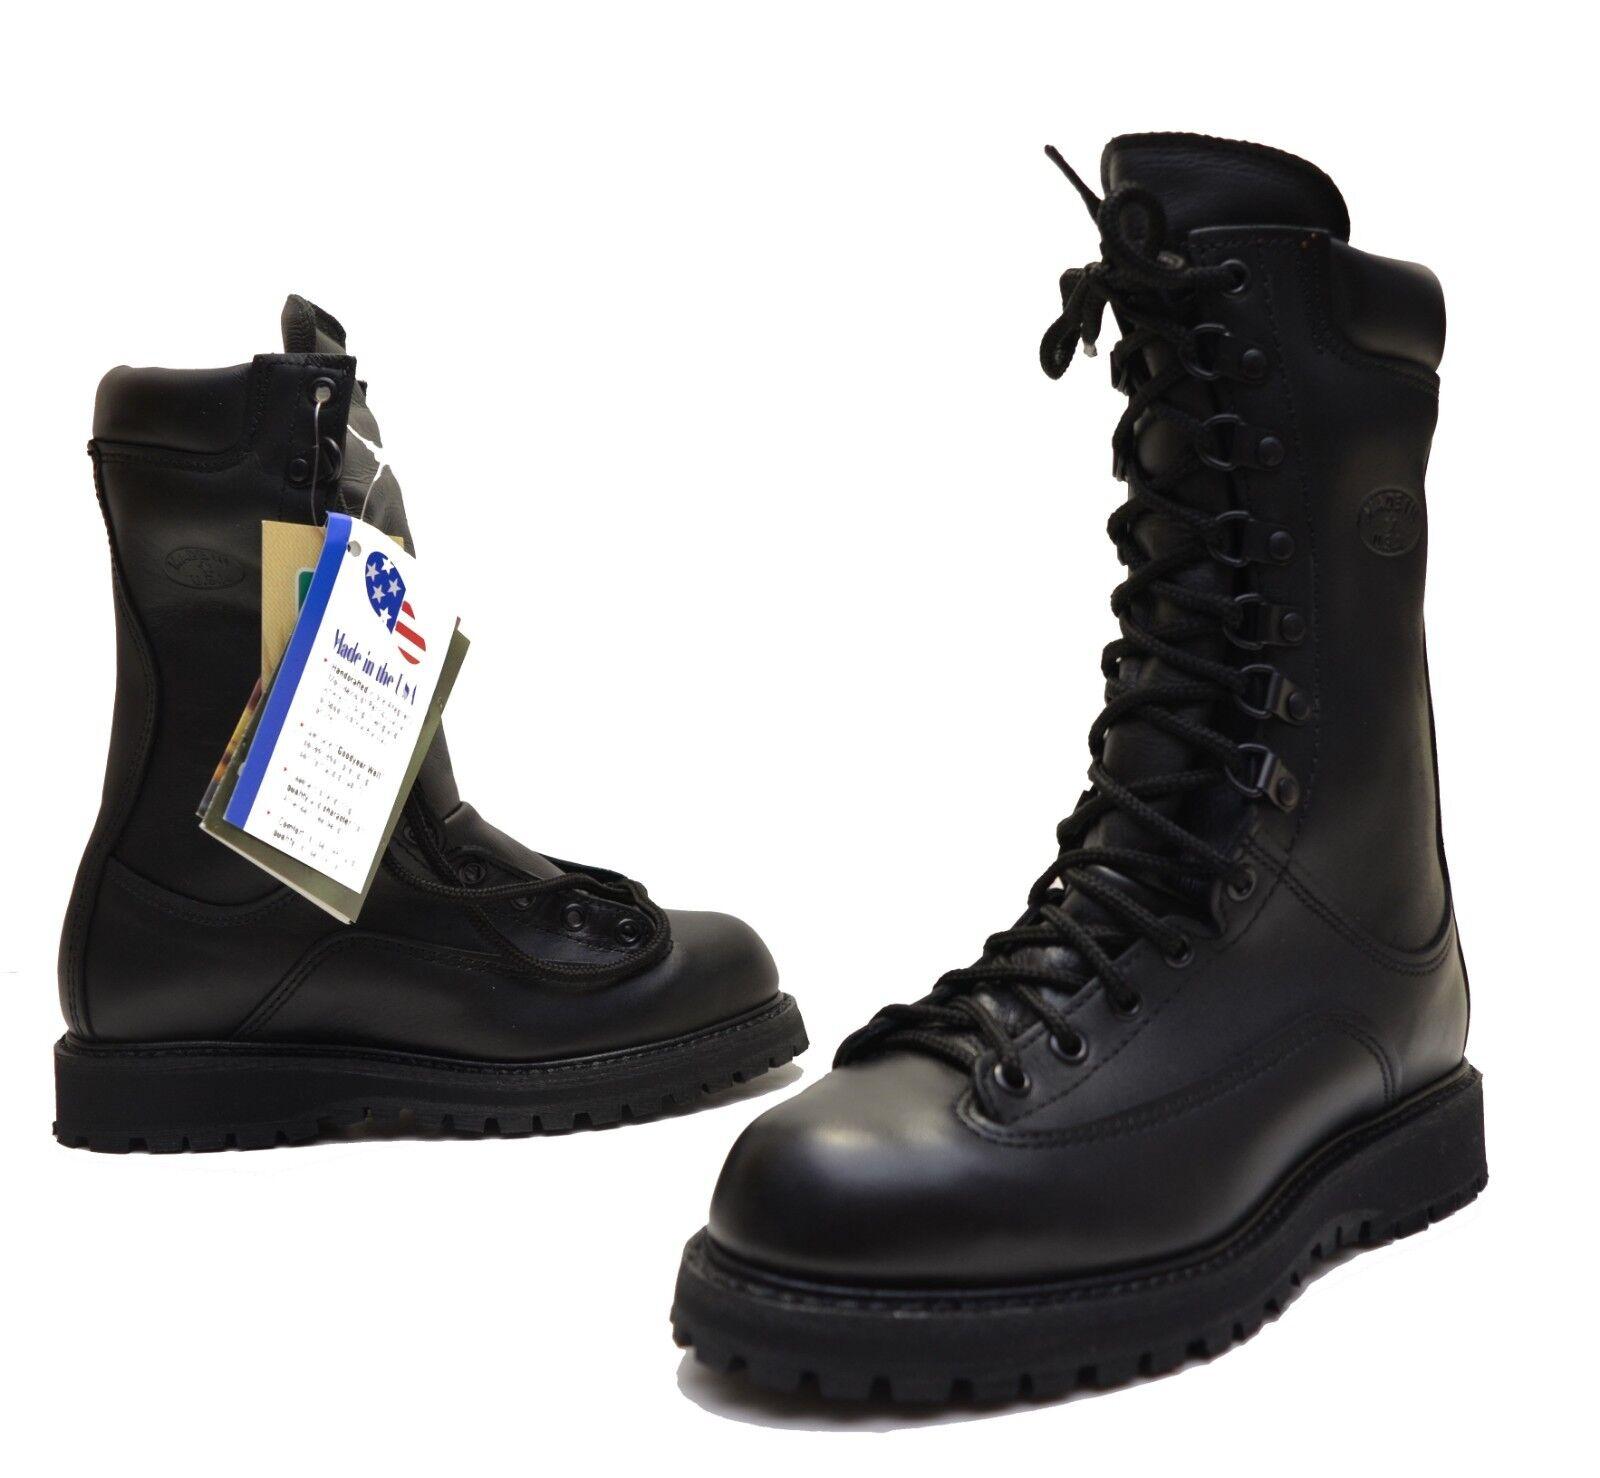 Matterhorn Model 1950 Boots 6.5 W - Gore Tex - Black Leather Insulated Field